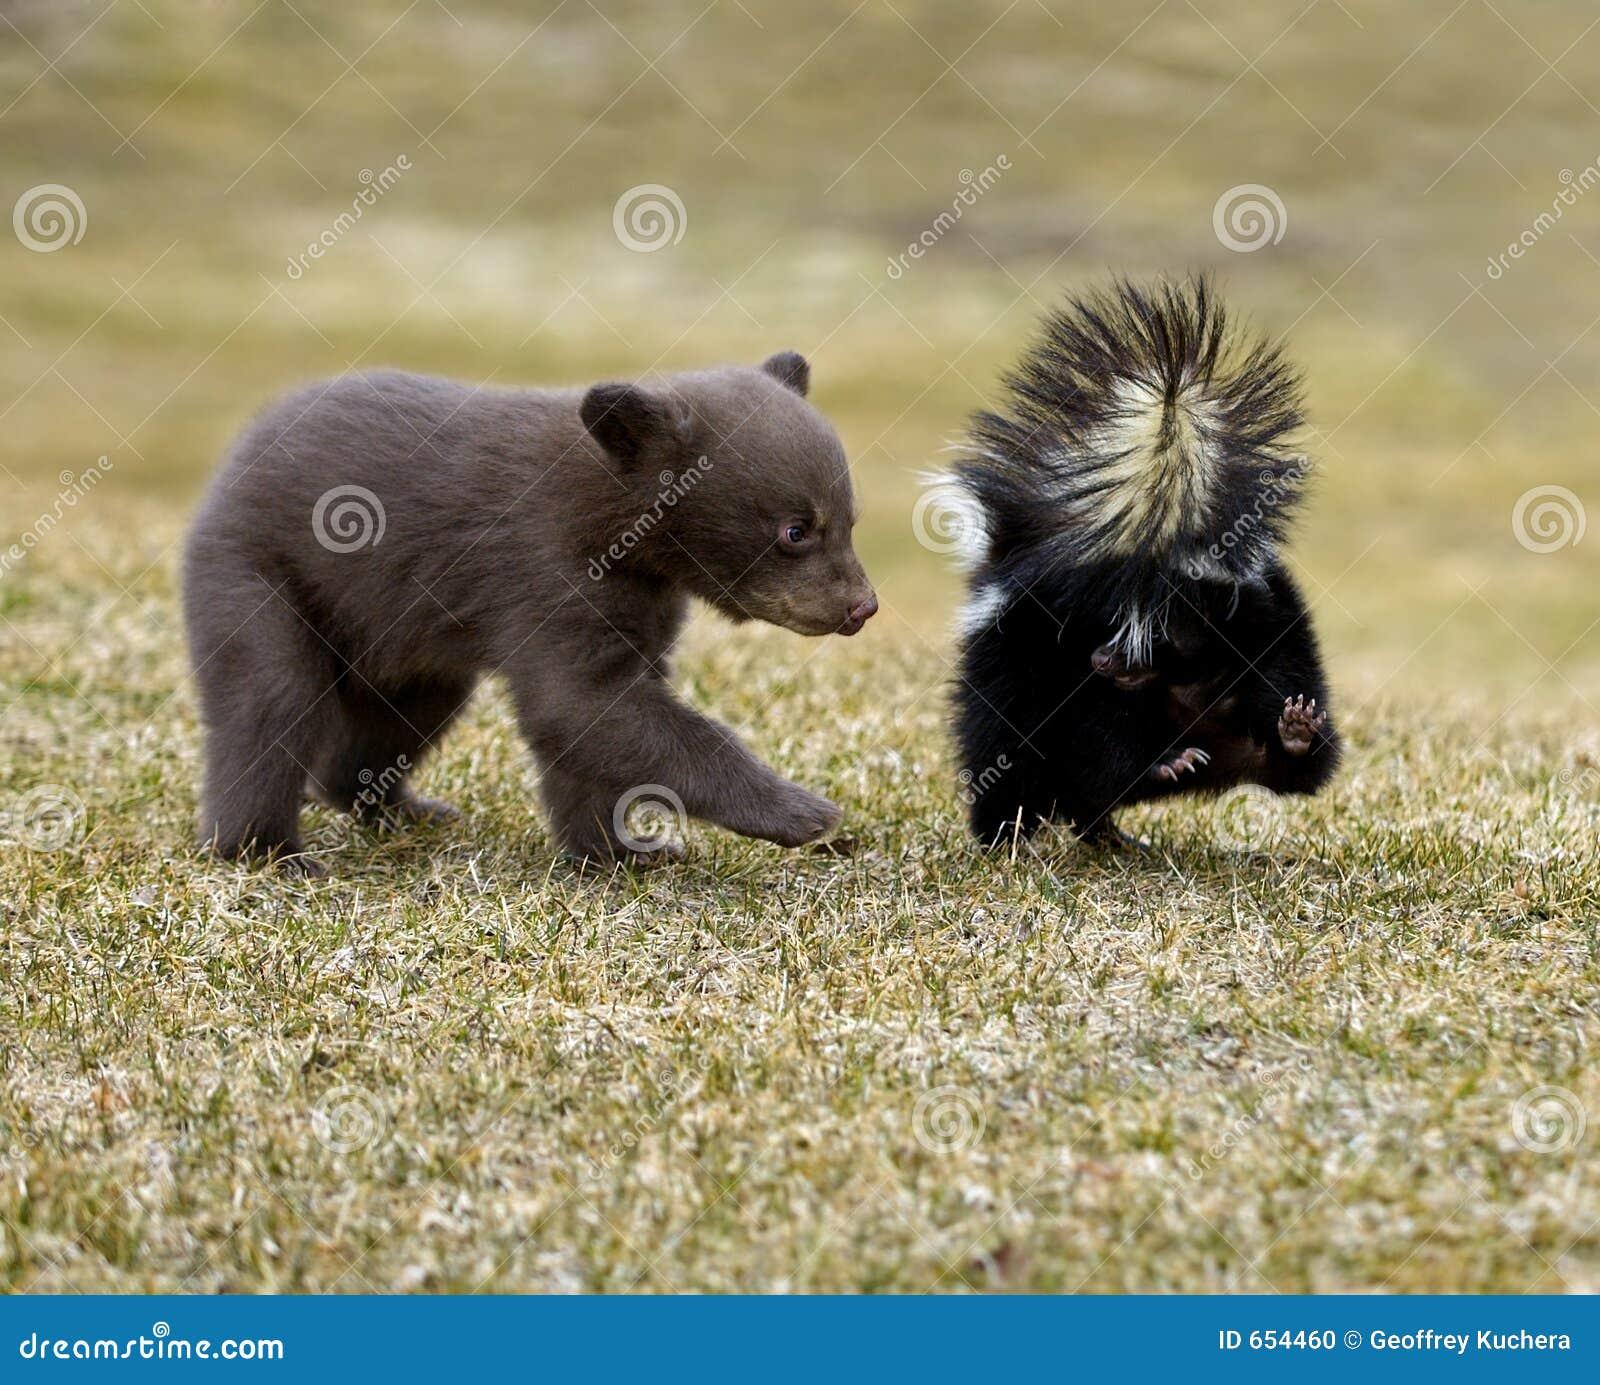 Urso preto curioso (Ursus americano) e jaritataca listrada